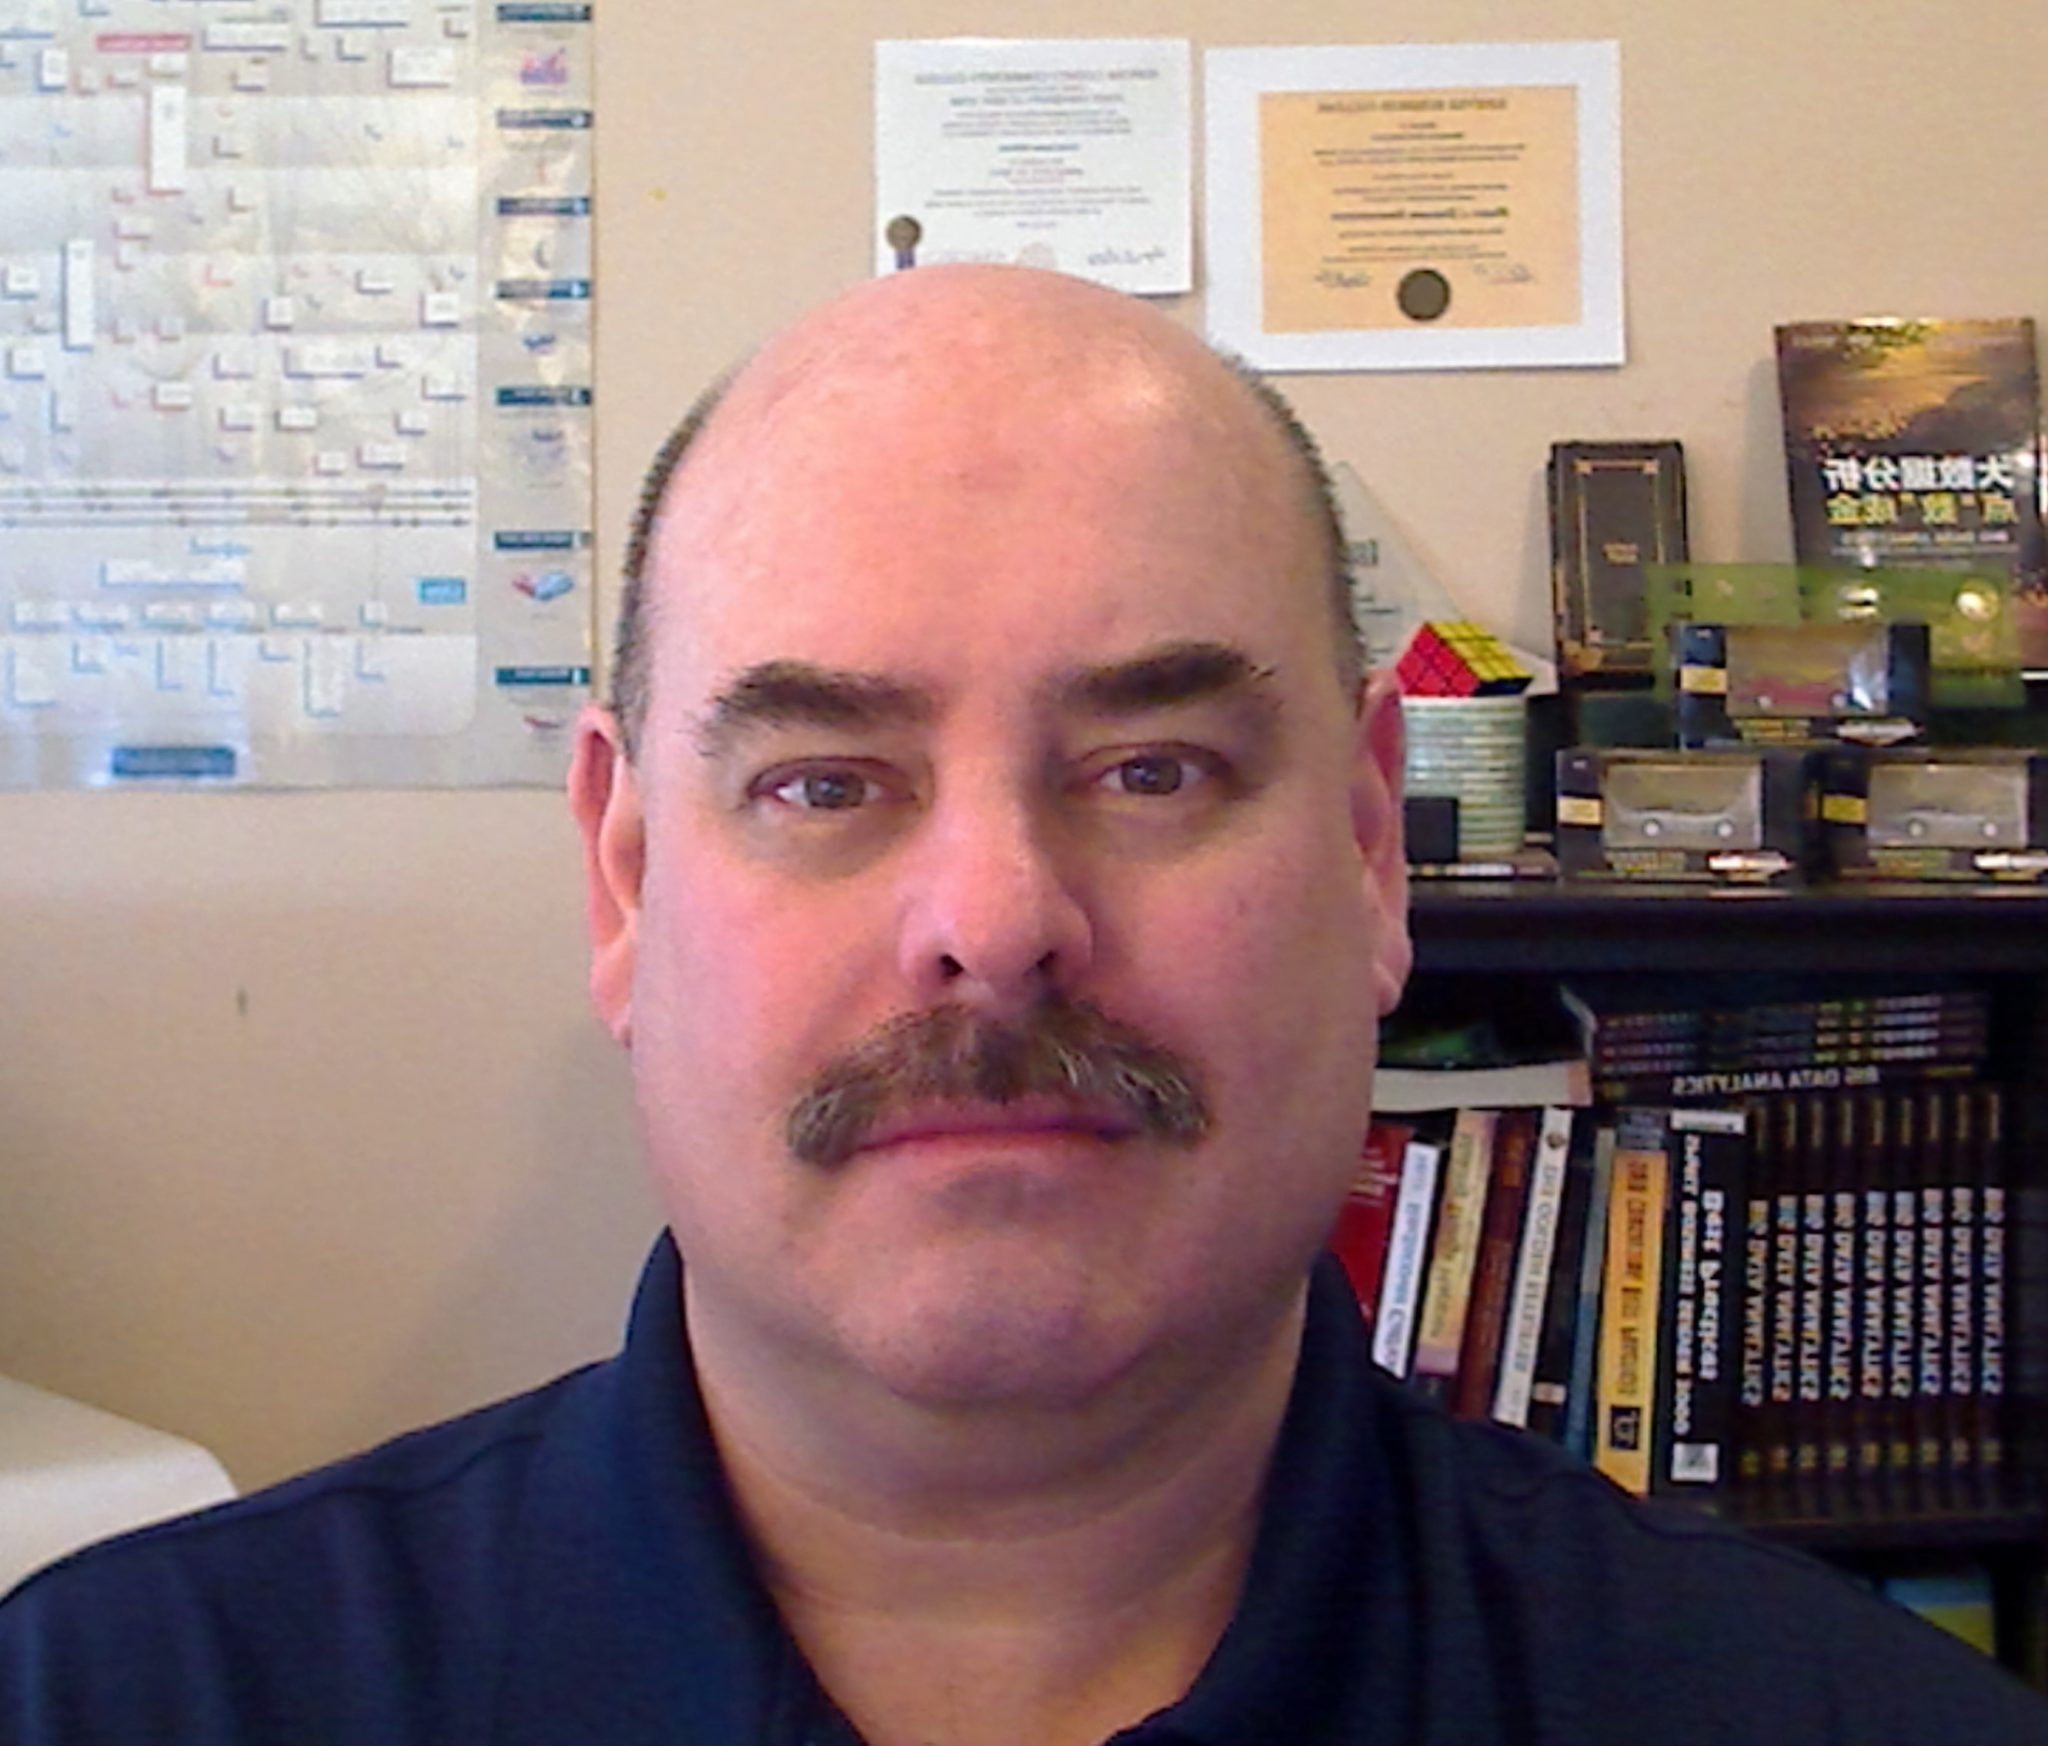 Frank J. Ohlhorst